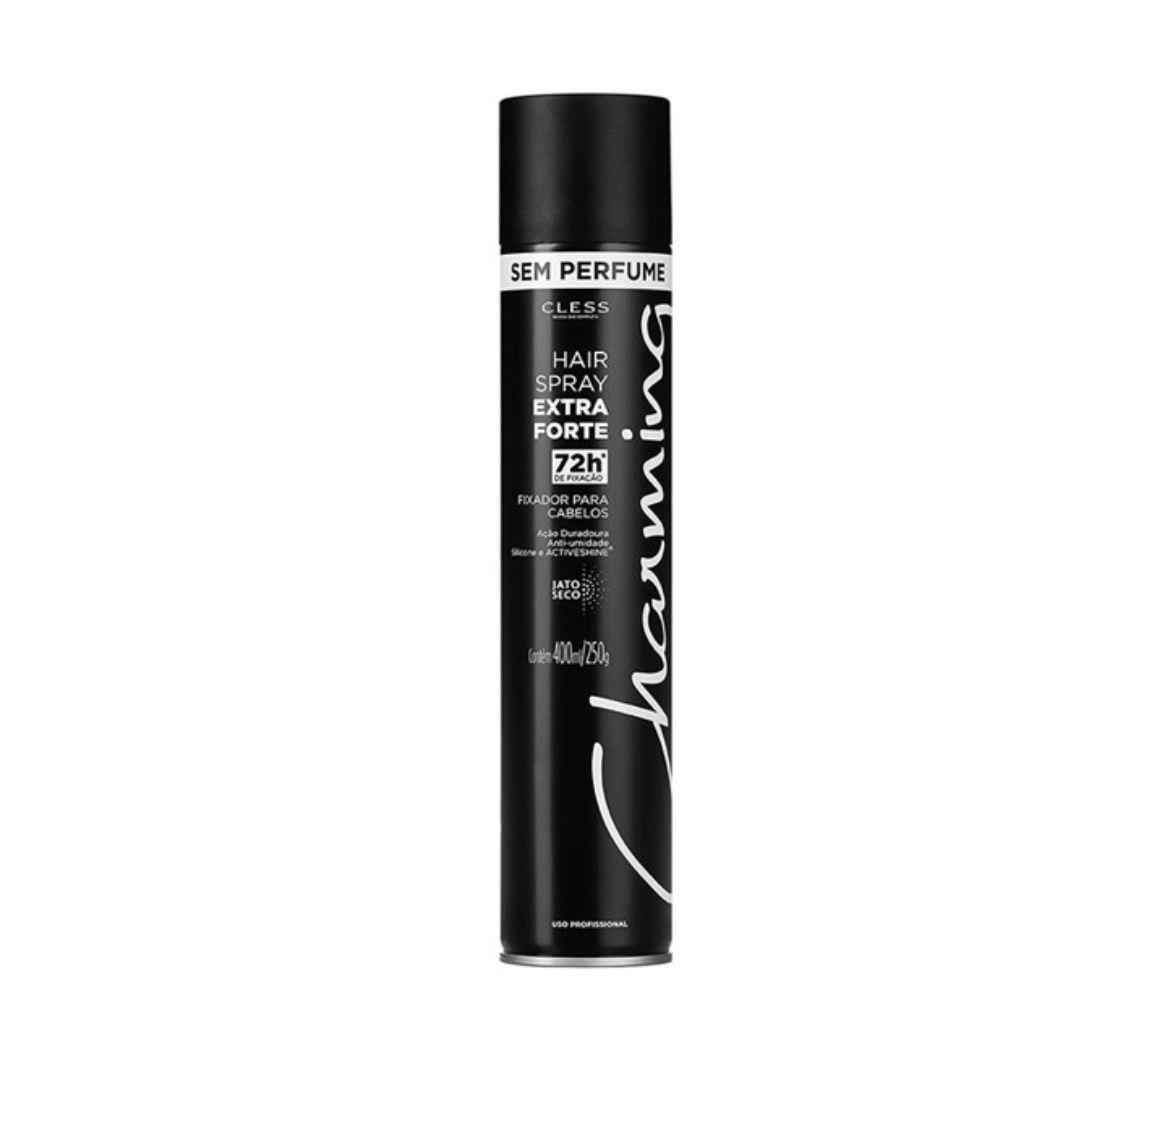 HAIR SPRAY CHARMING EXTRA FORTE SEM PERFUME 400ML